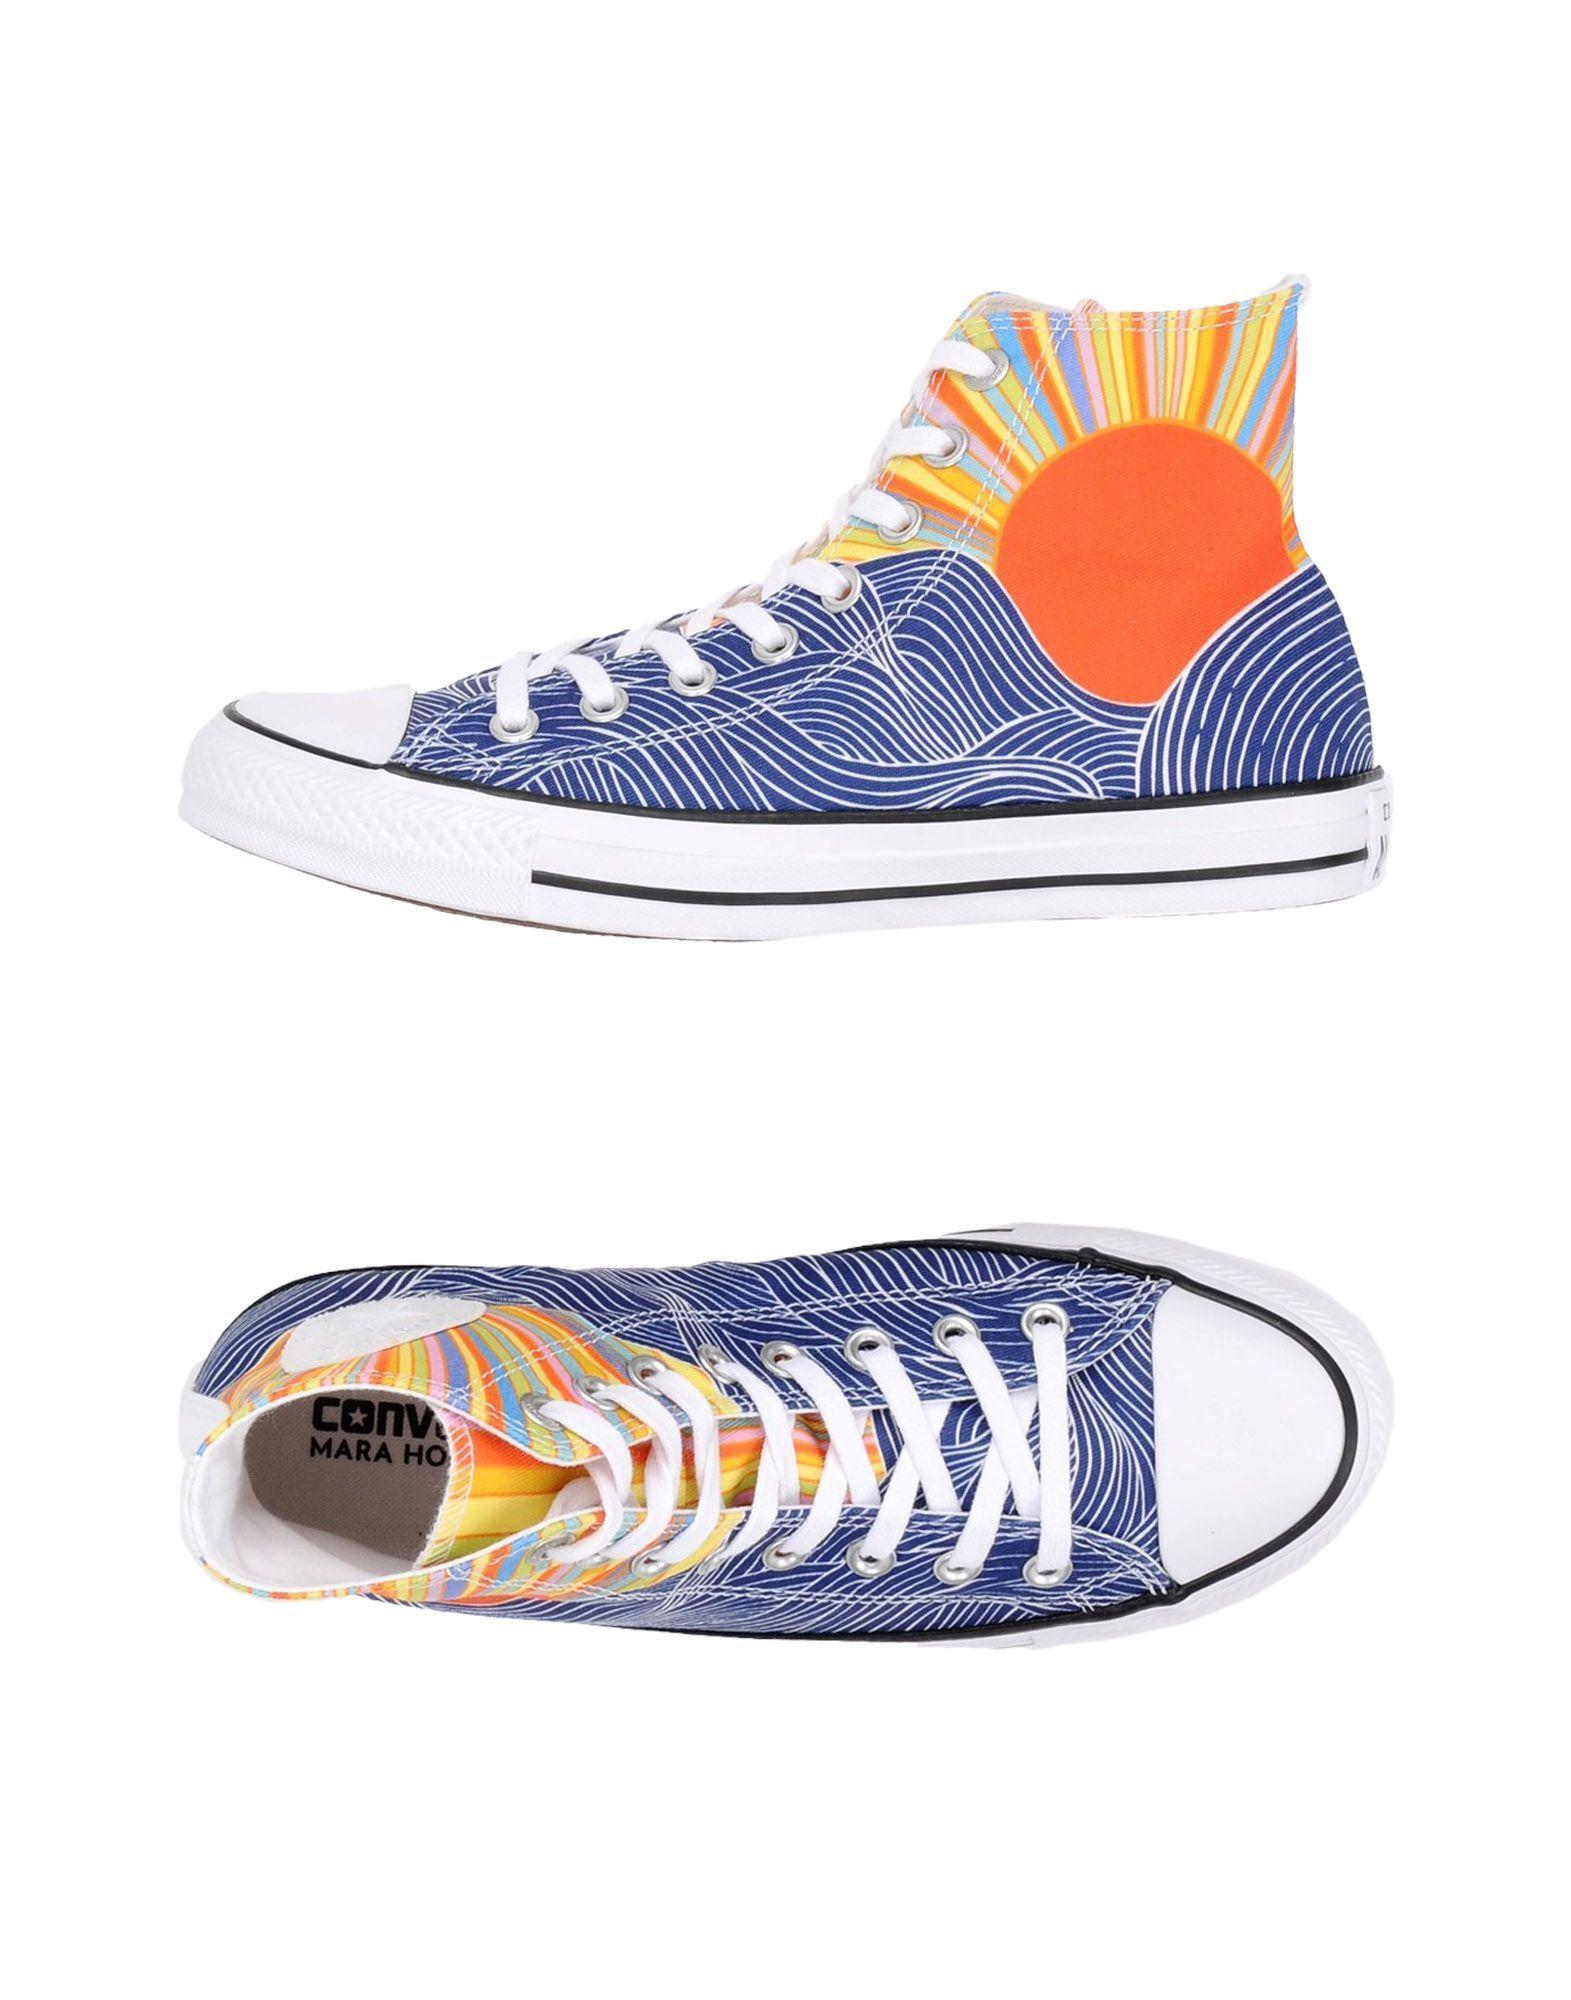 ALL STAR HI-OX - FOOTWEAR - High-tops & sneakers on YOOX.COM Converse uh3KU